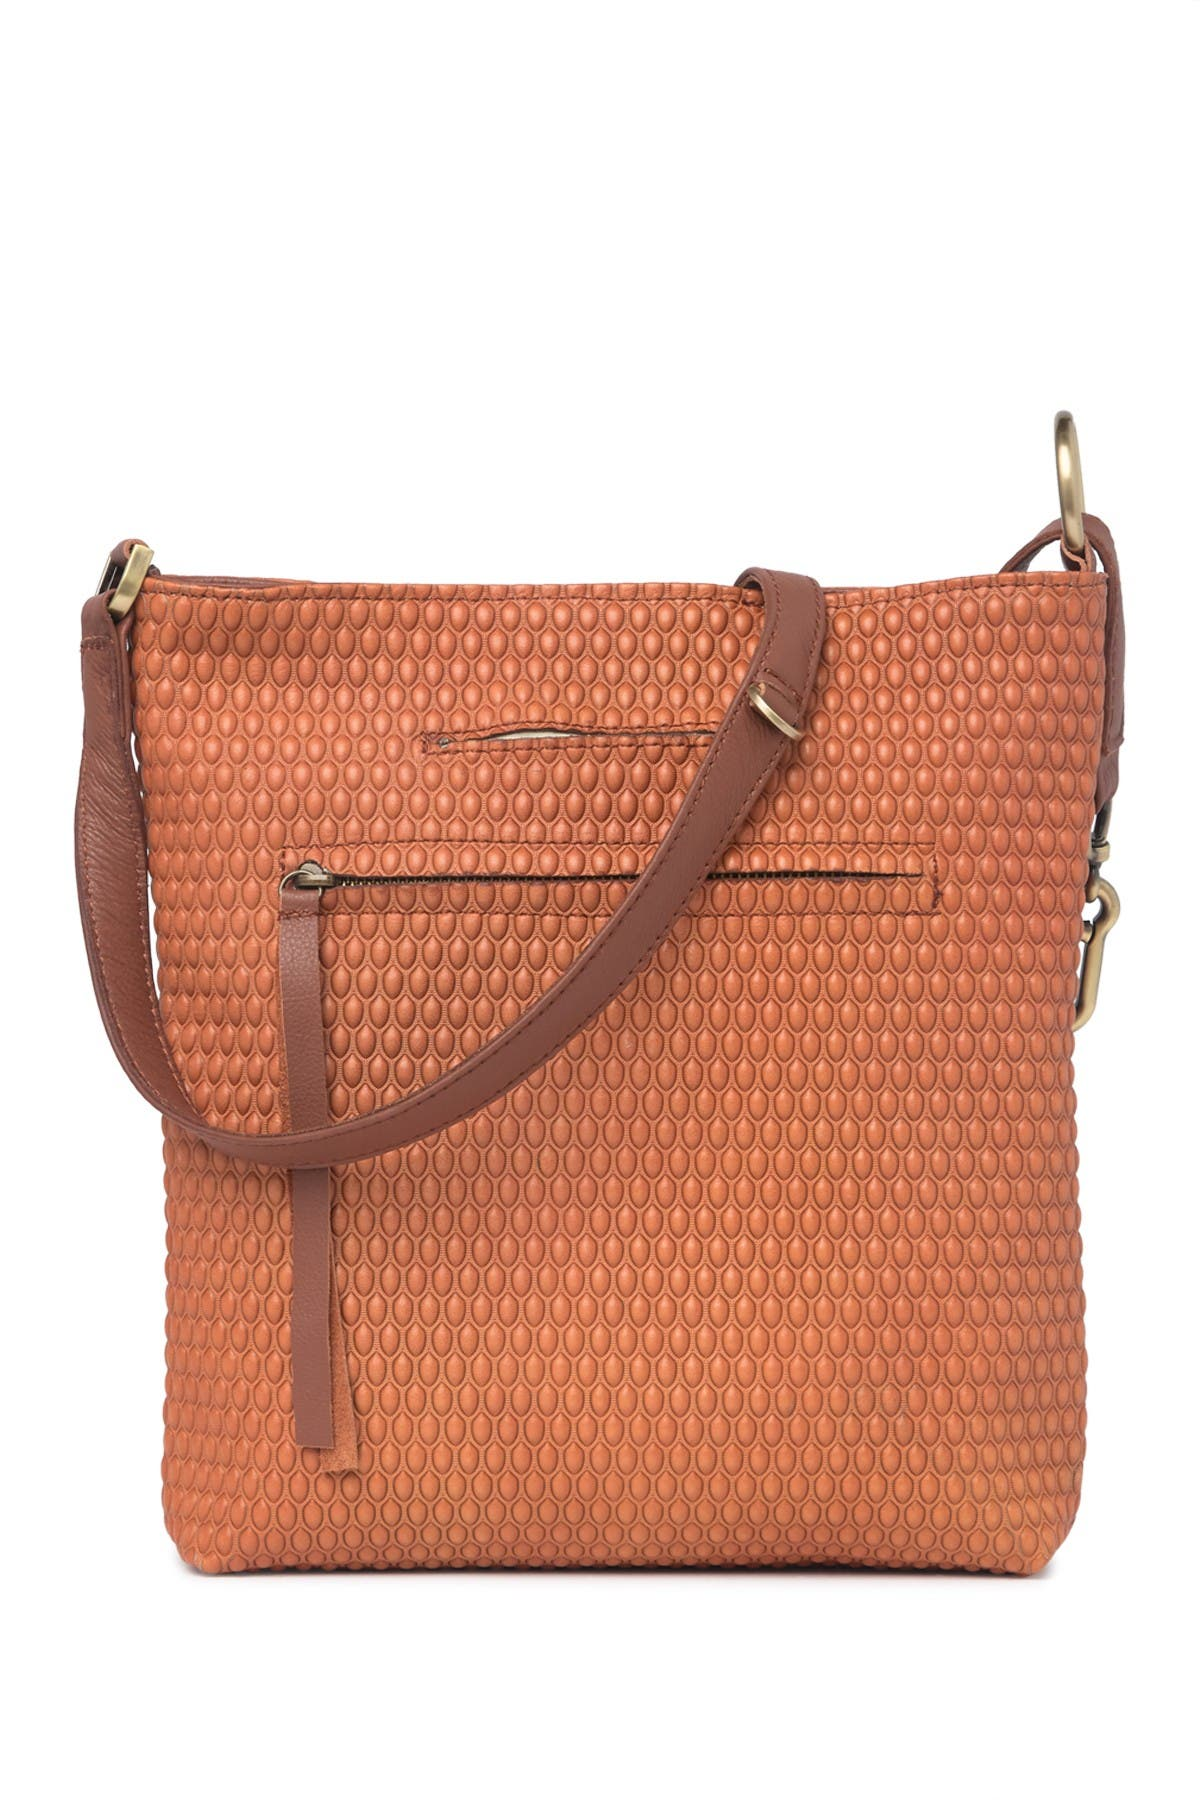 Image of Carla Mancini Riley Top Zippered Crossbody Bag